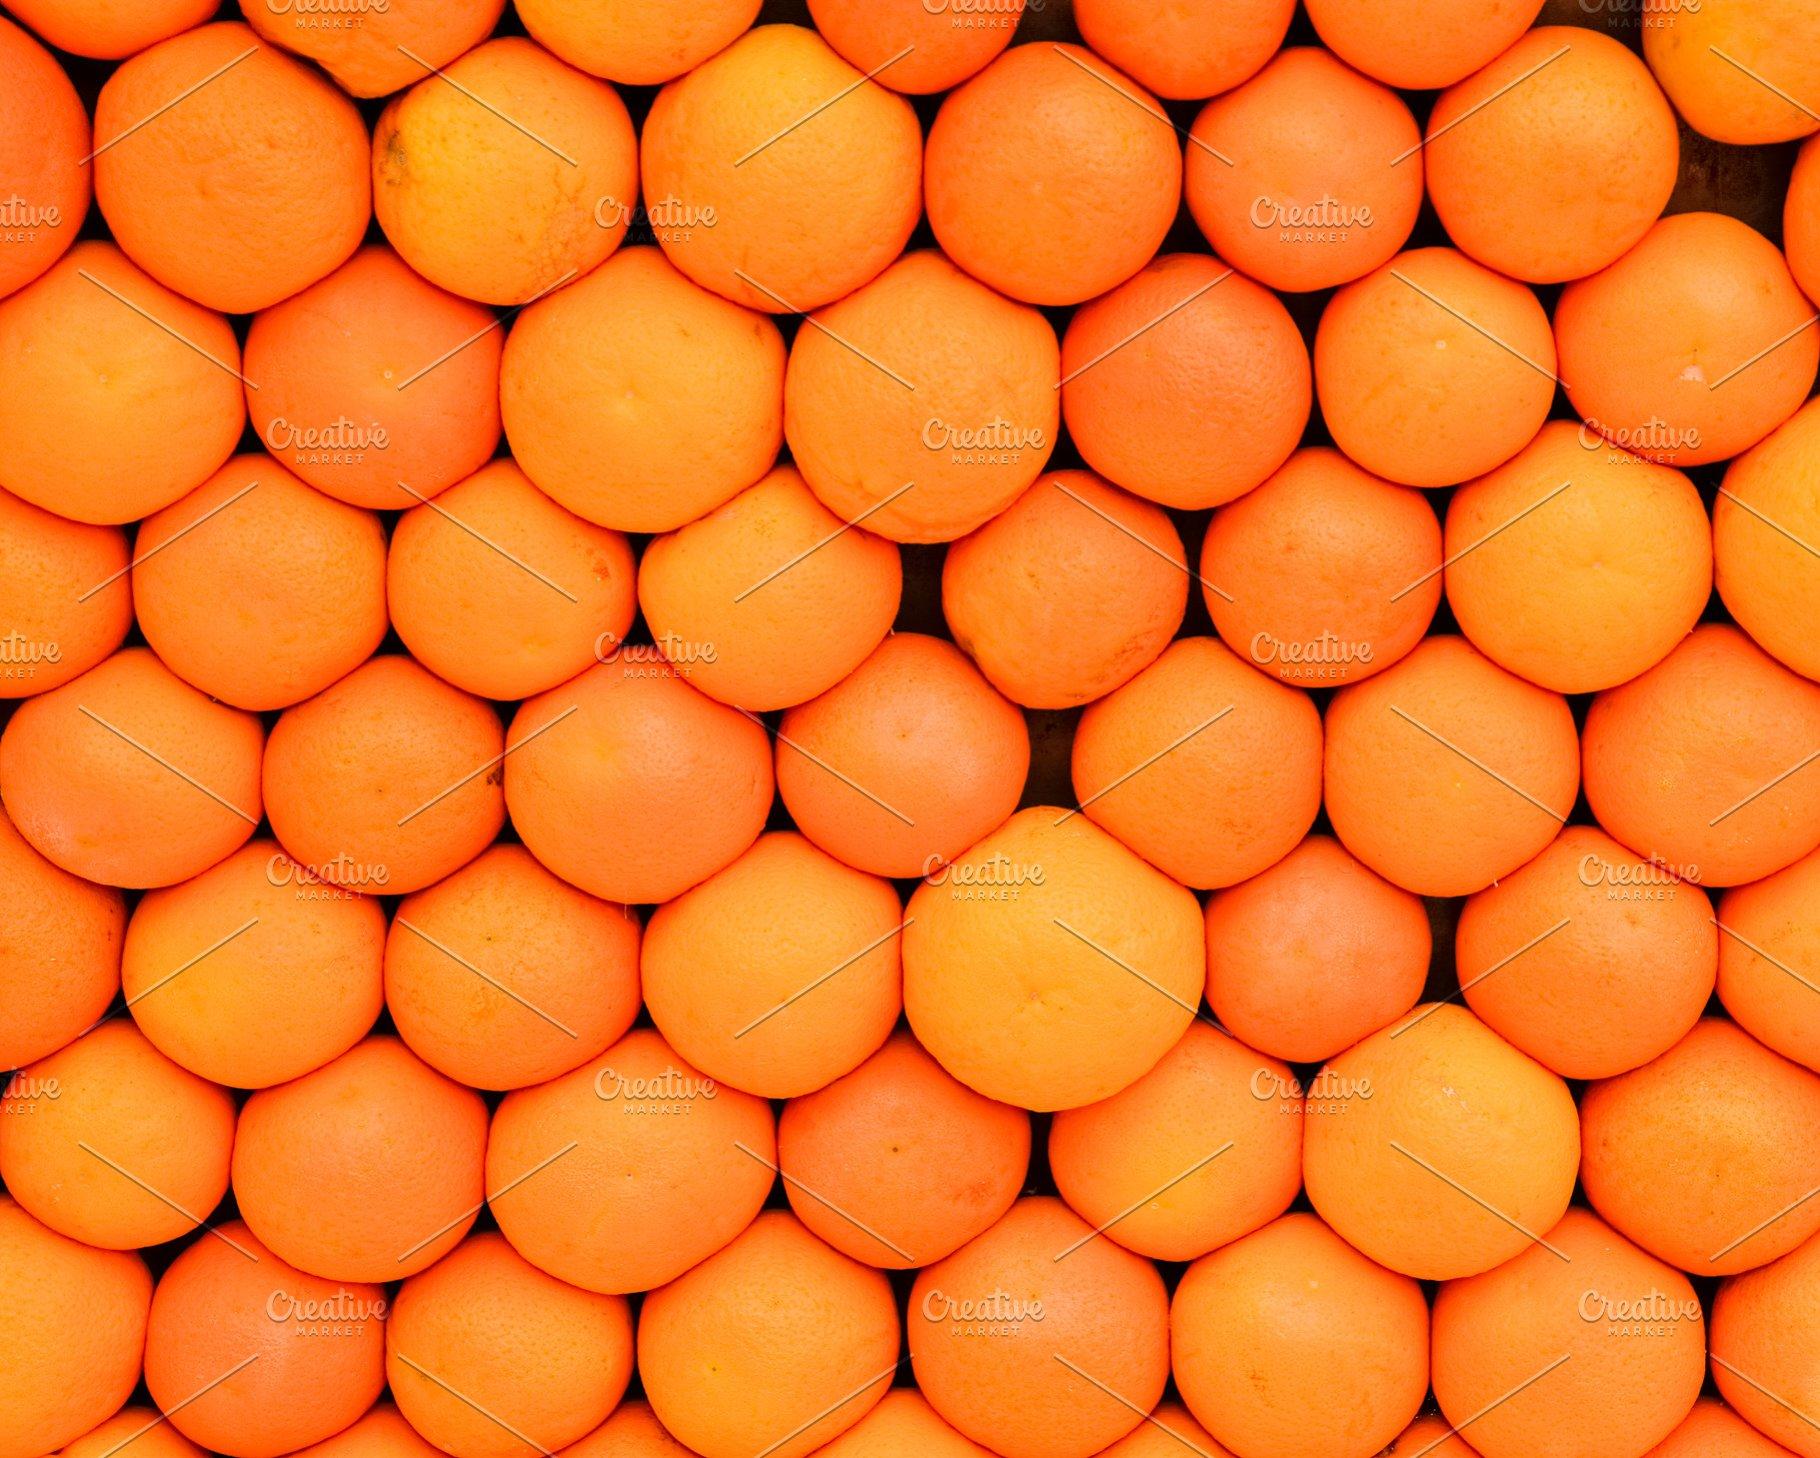 Background Texture Of Orange Fruit